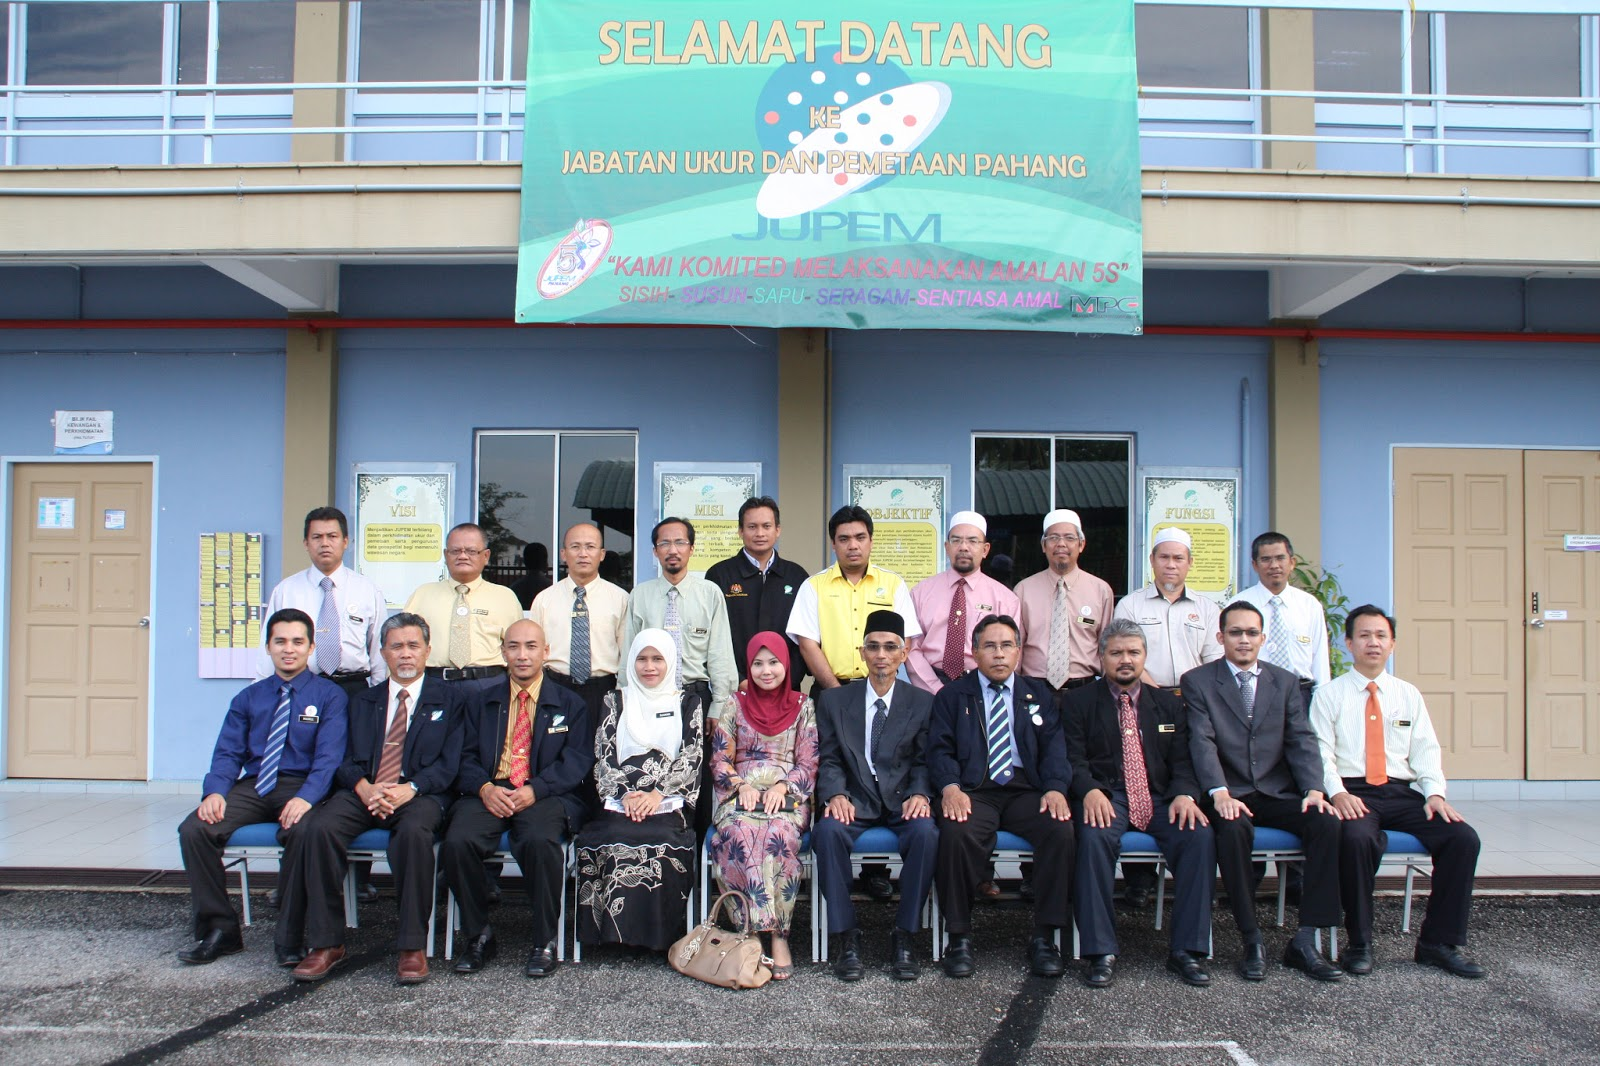 Sudut Qe 5s Jupem Pahang Sekitar Audit Persijilan Semula Persekitaran Berkualiti Qe 5s Jupem Pahang